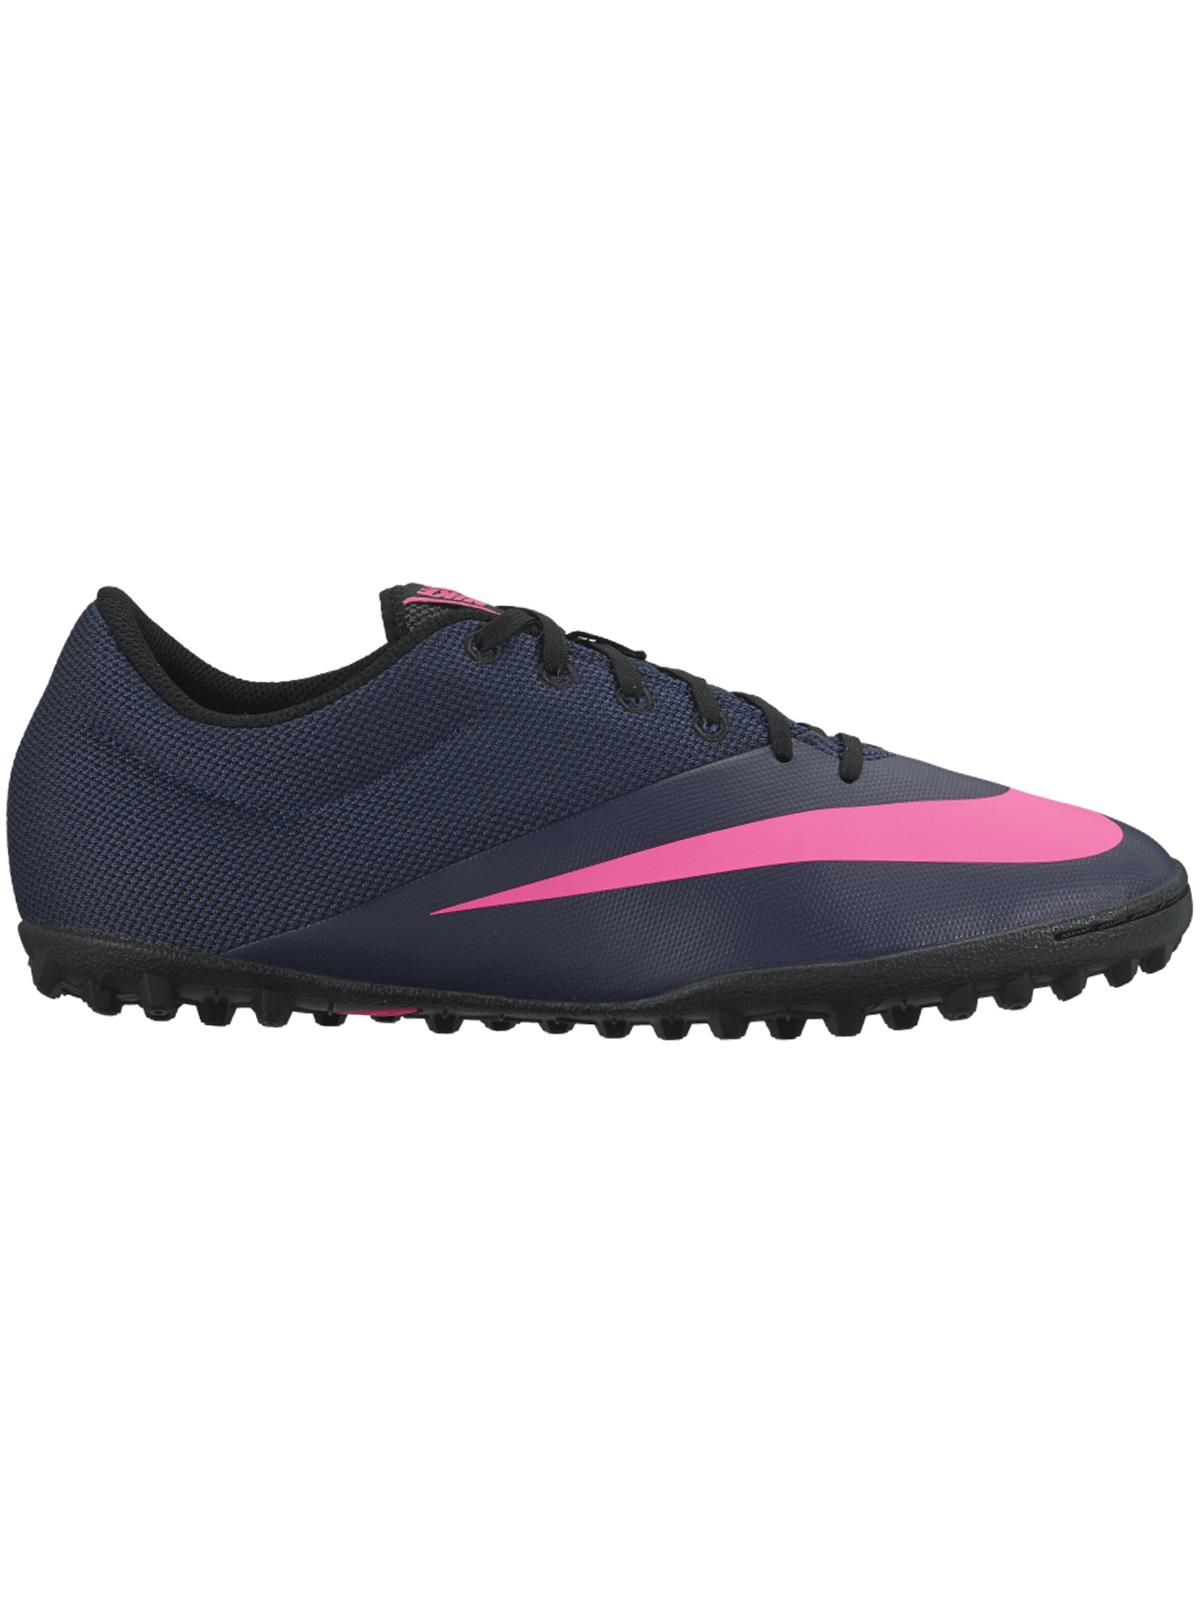 Nike MercurialX Pro Tf Blu/Fucsia 725245 446